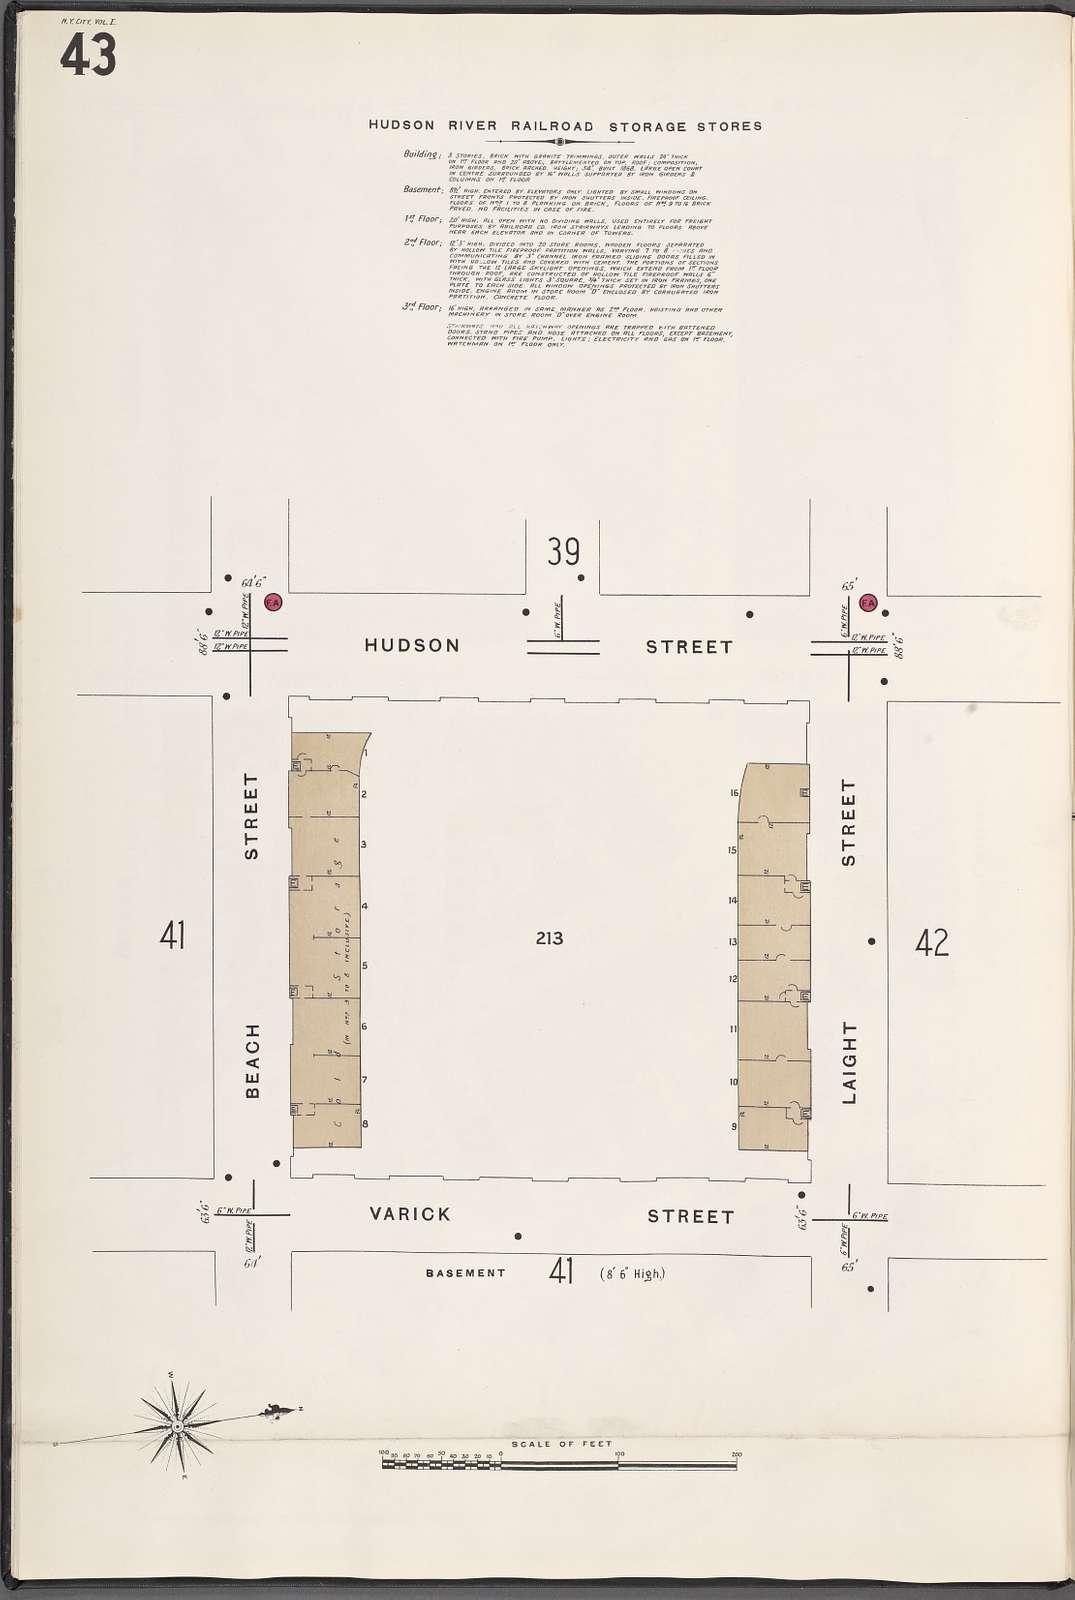 Manhattan, V. 1, Plate No. 43 [Map of Hudson River Railroad storage stores: basement, bounded by Hudson St., Laight St., Varick St., Beach St.]